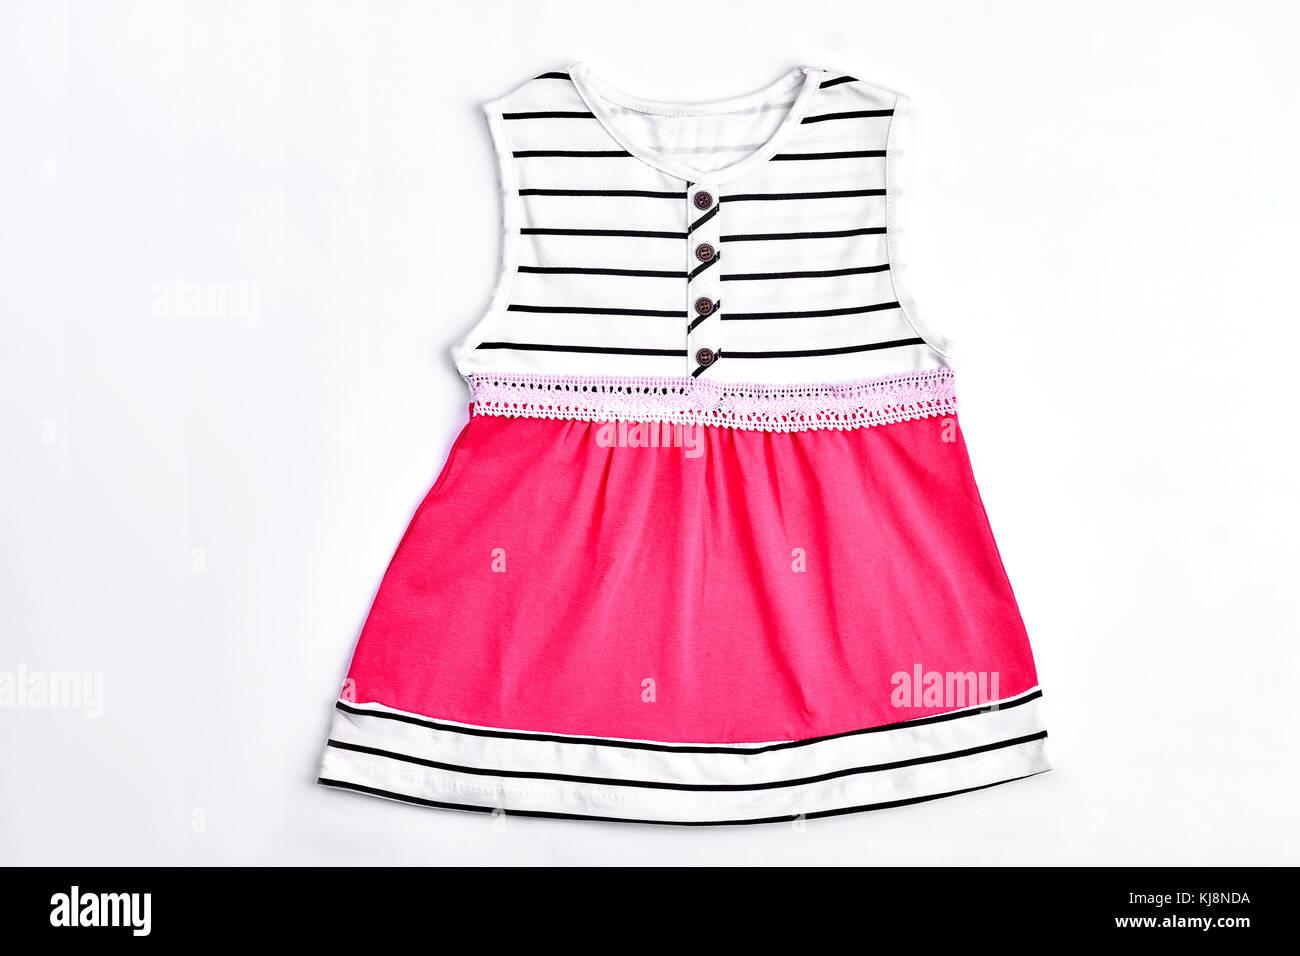 9f14bf632f626 Top quality fashion robe bébé. belle rose à rayures et robe à bretelles